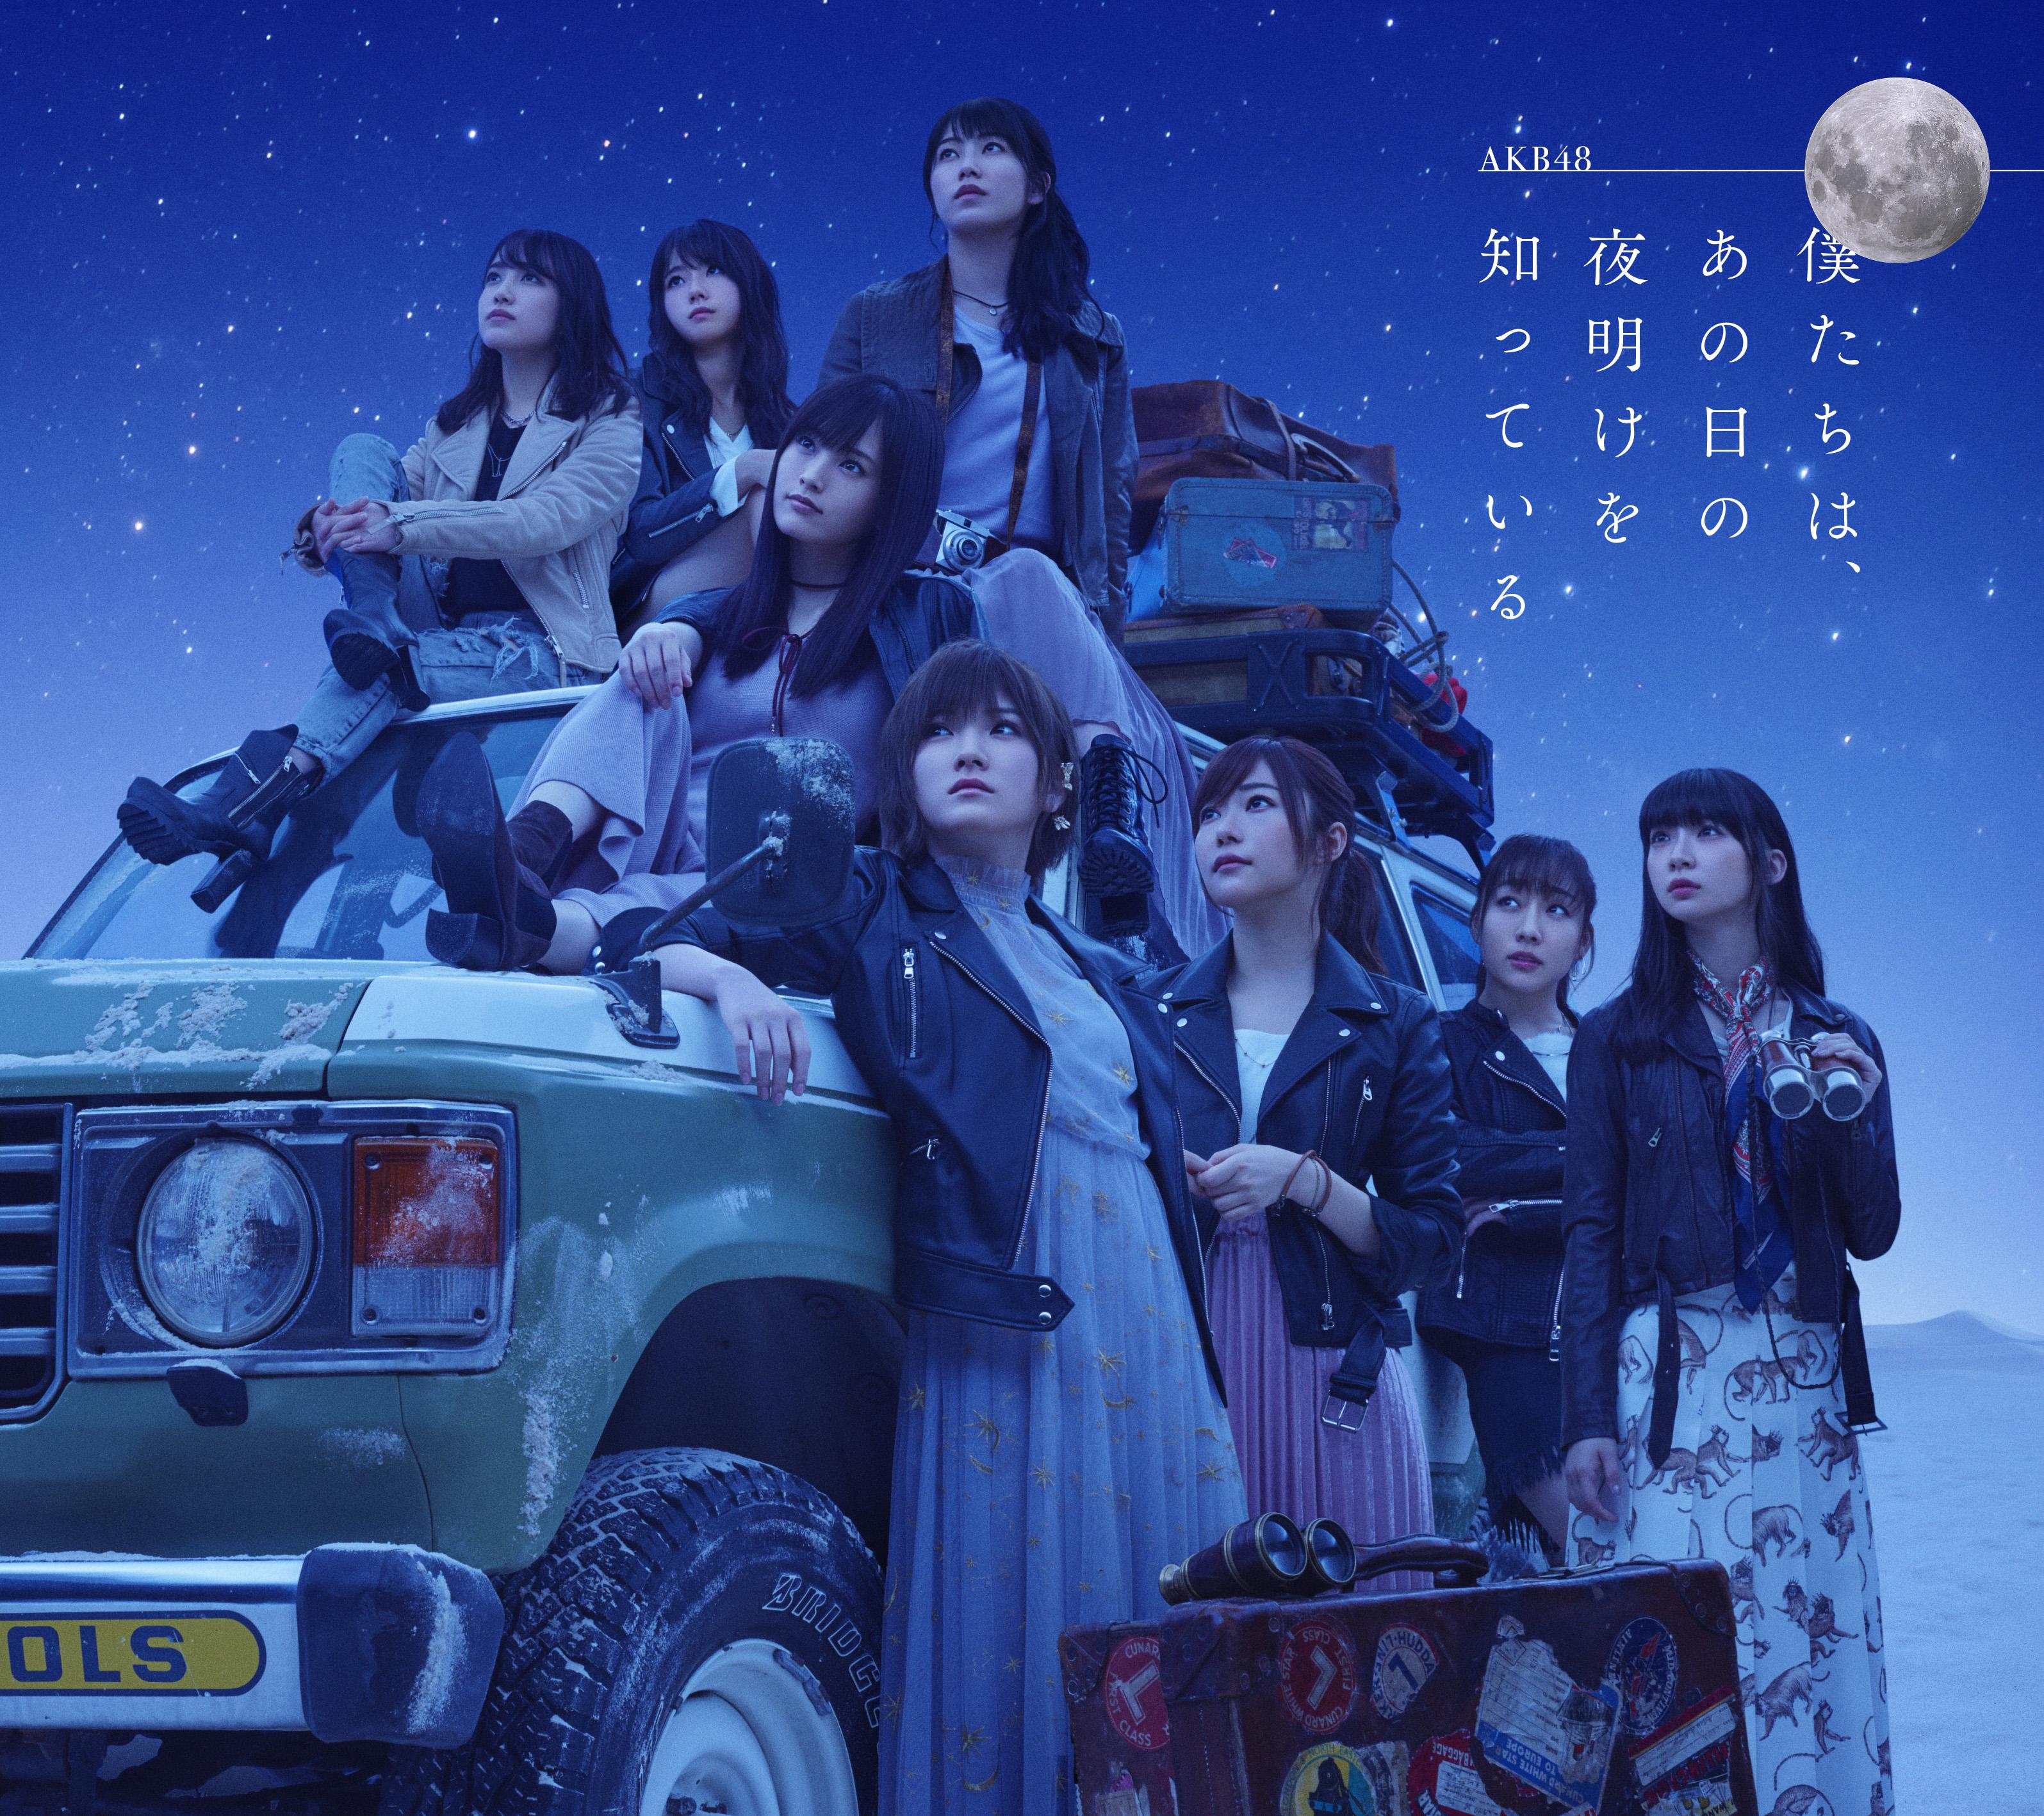 "<img src=""/a/img/pc/ico_top_oritoku.gif"" alt=""オリ特"" class=""oritoku"" />予約☆AKB48『僕たちは、あの日の夜明けを知っている』"